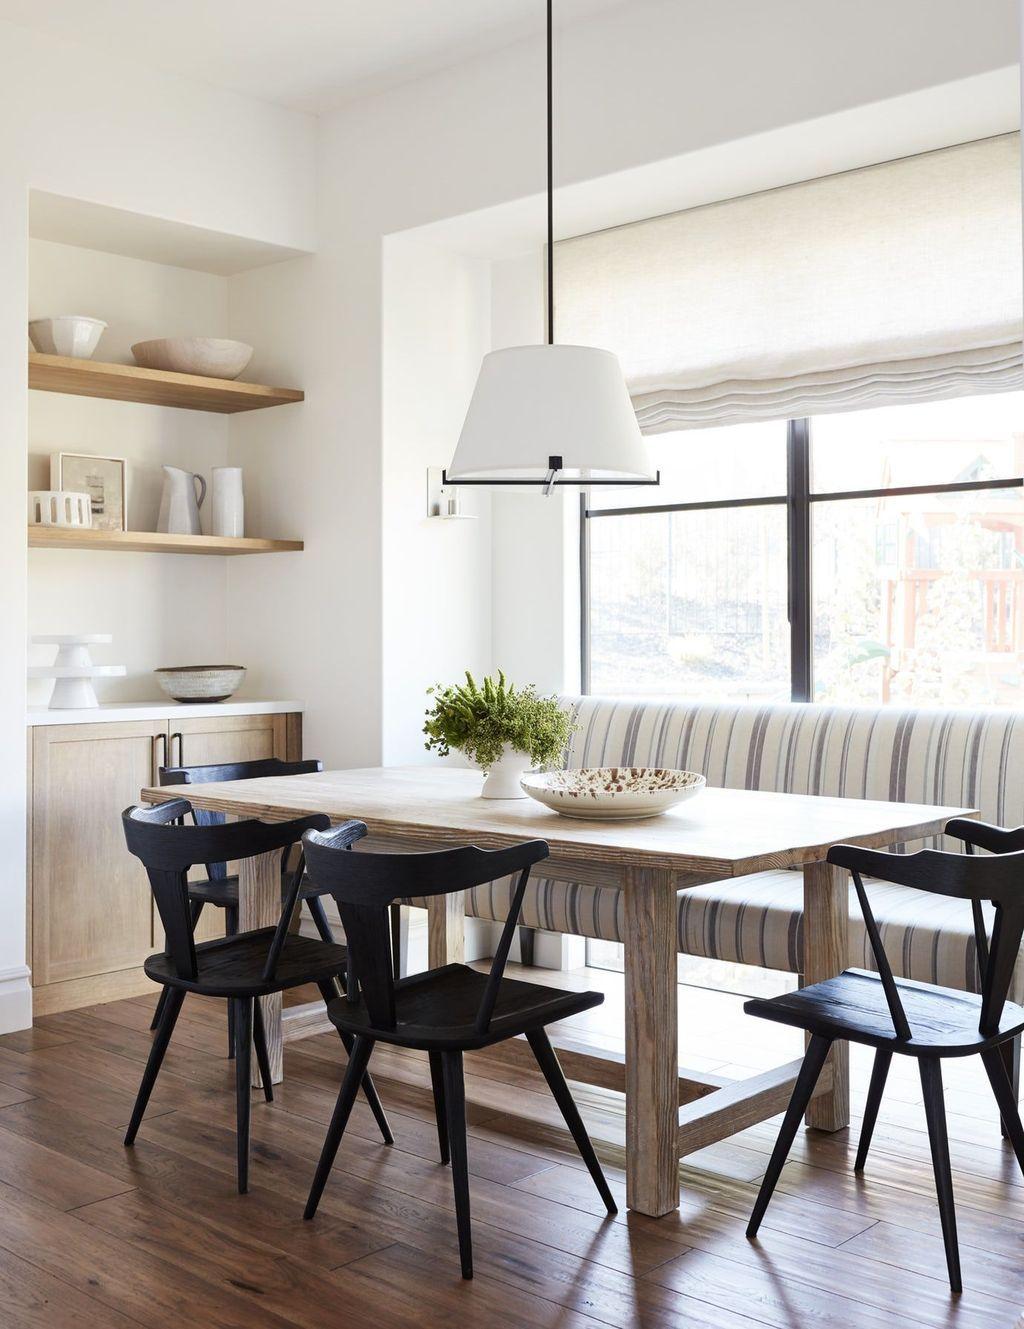 40 Classy Modern Contemporary Dining Room Ideas Light Wood Dining Table Dining Room Design Dining Room Windows